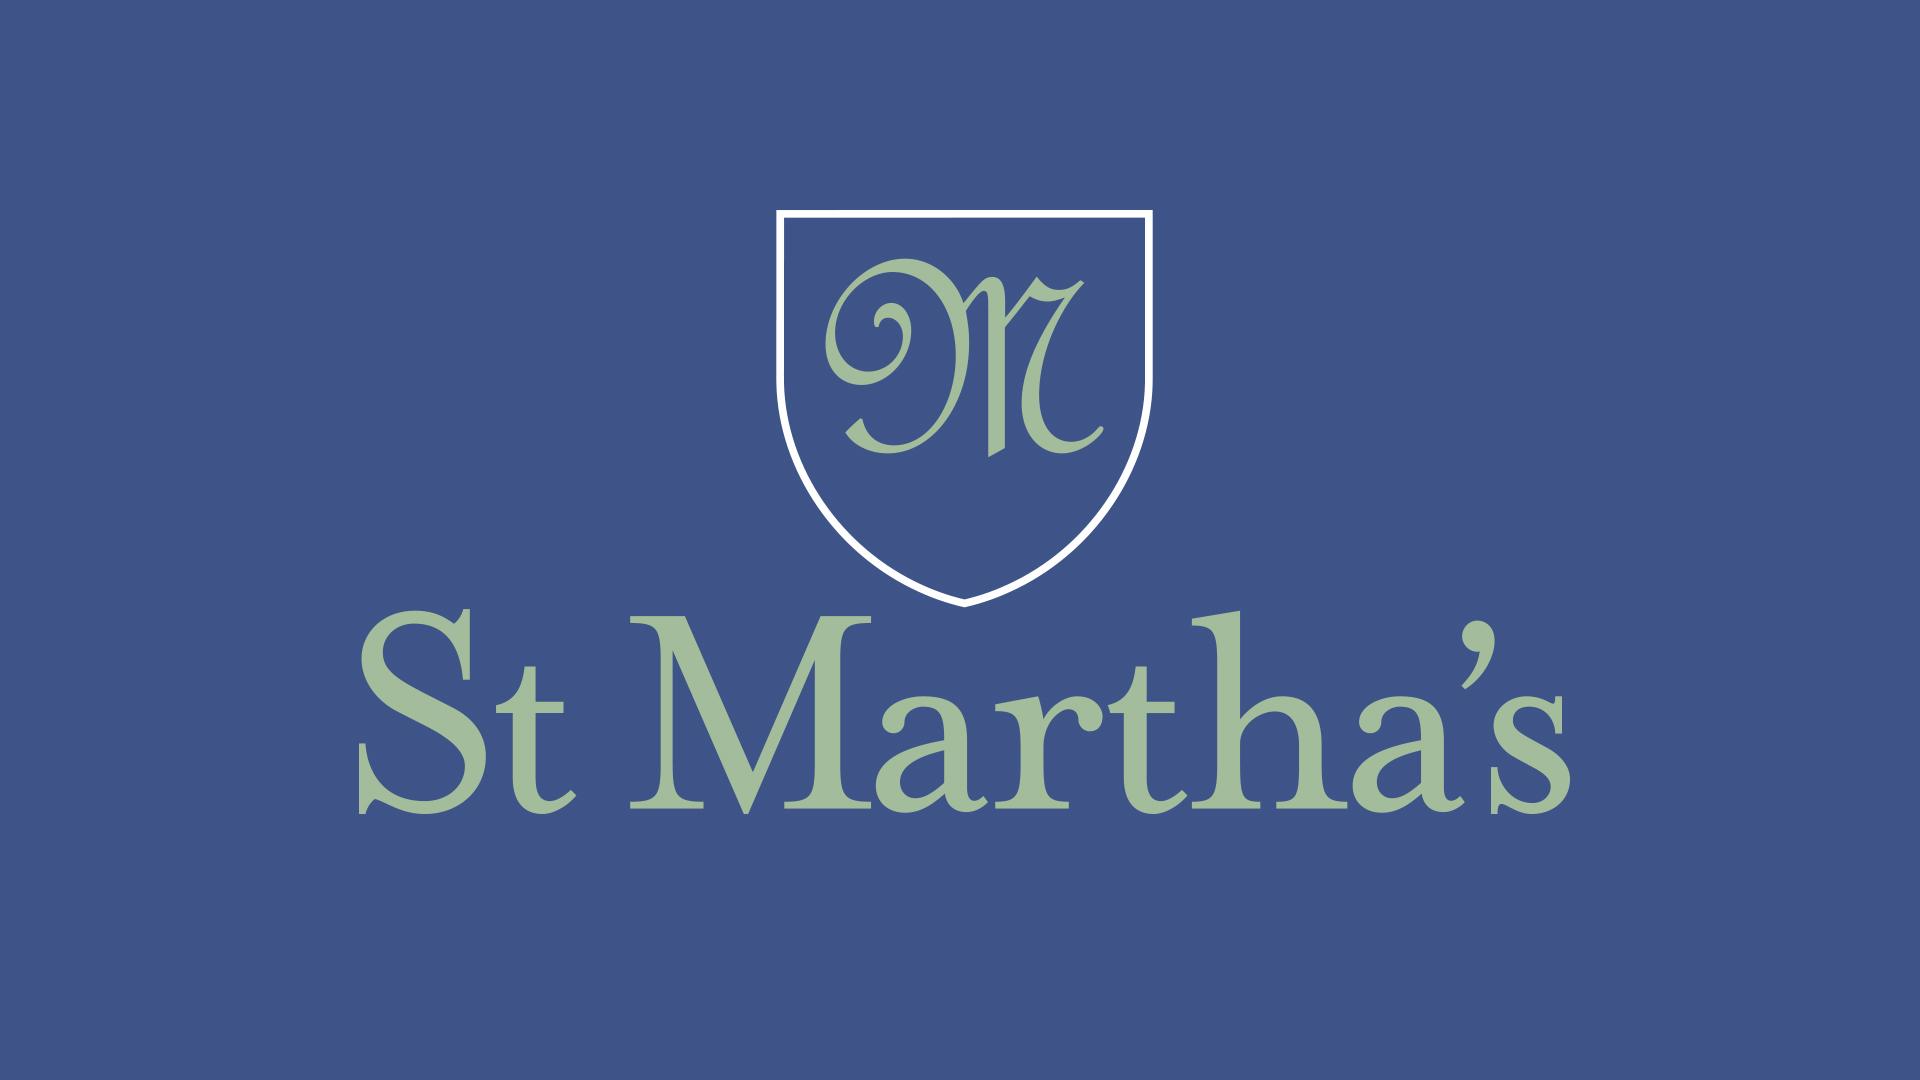 St Marthas School branded logo